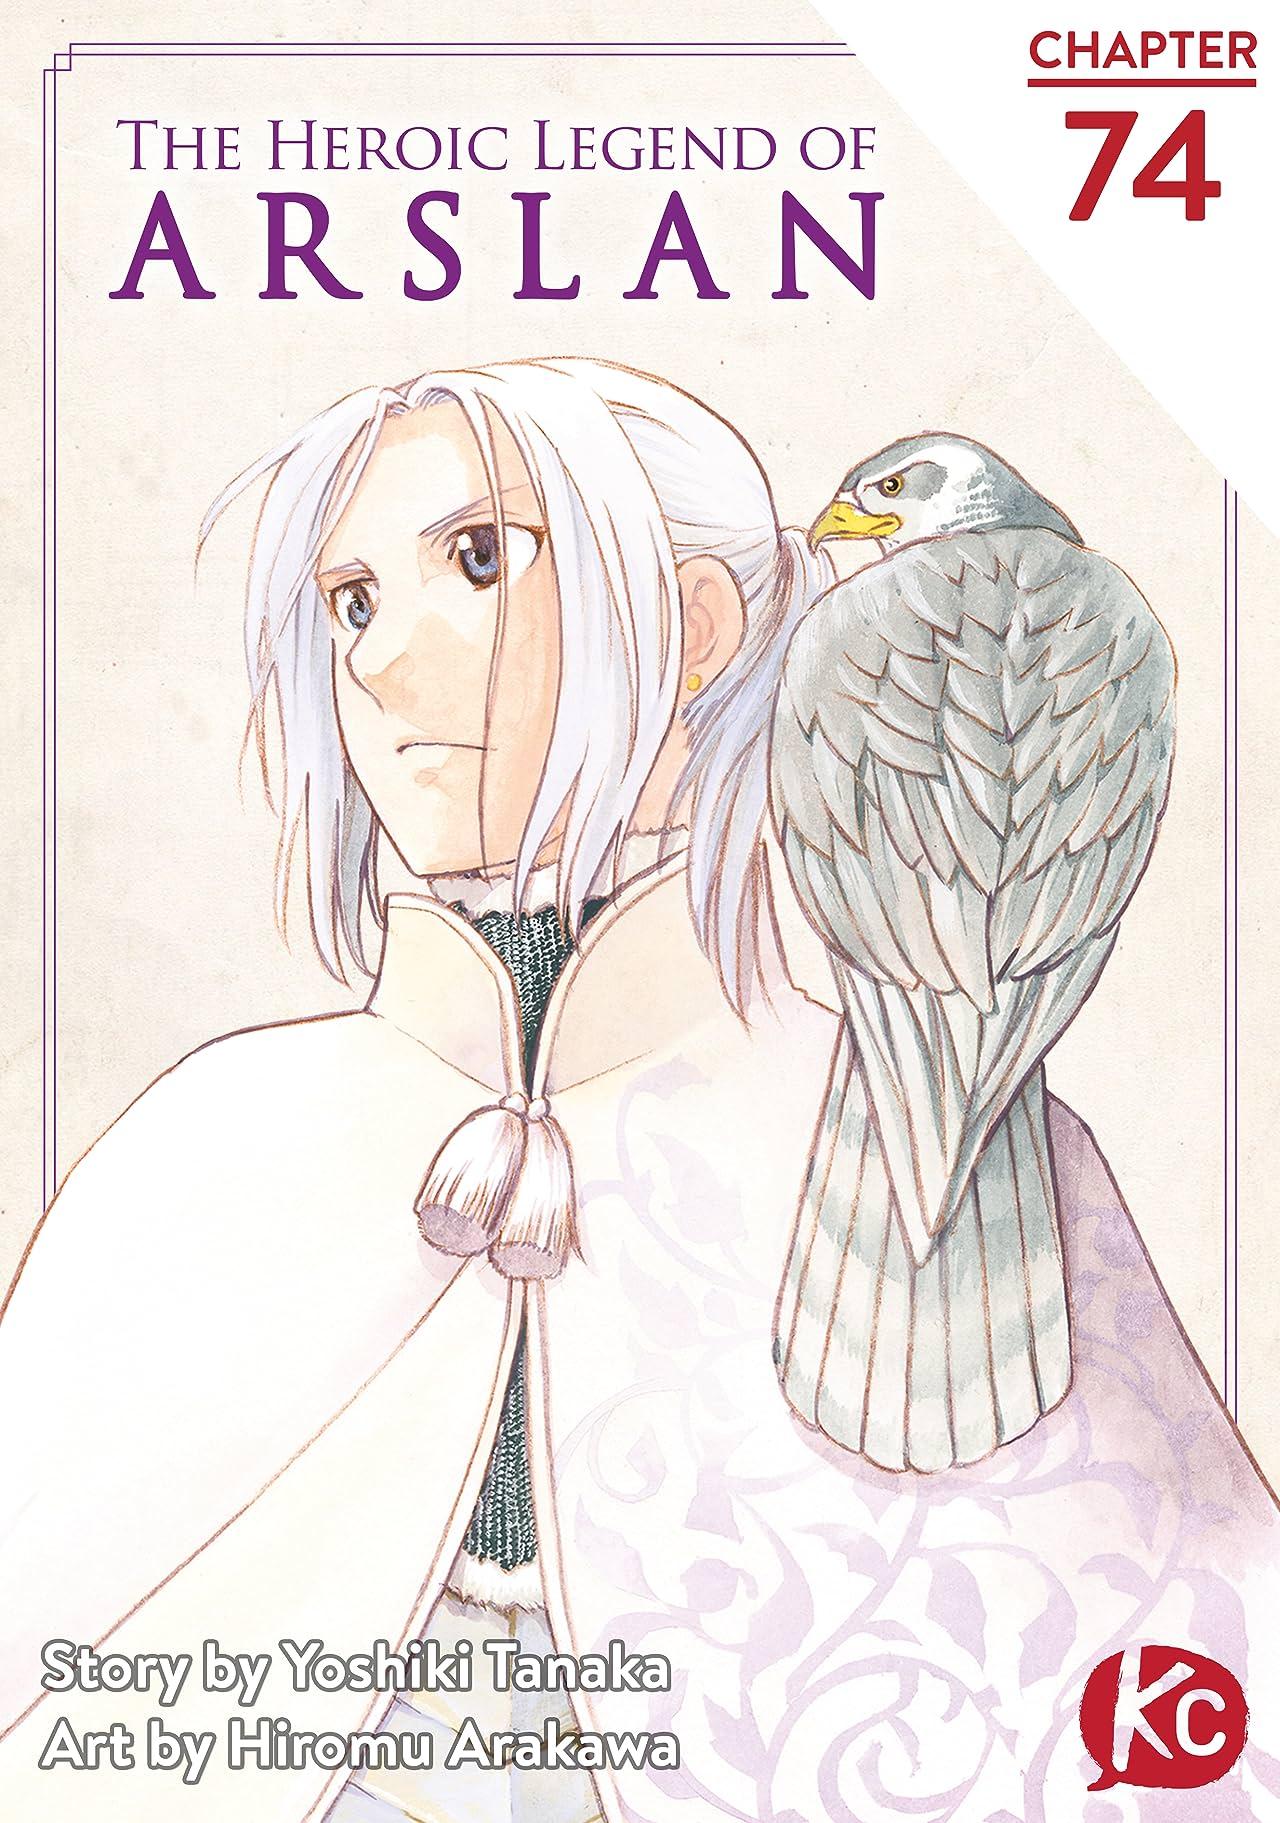 The Heroic Legend of Arslan No.74